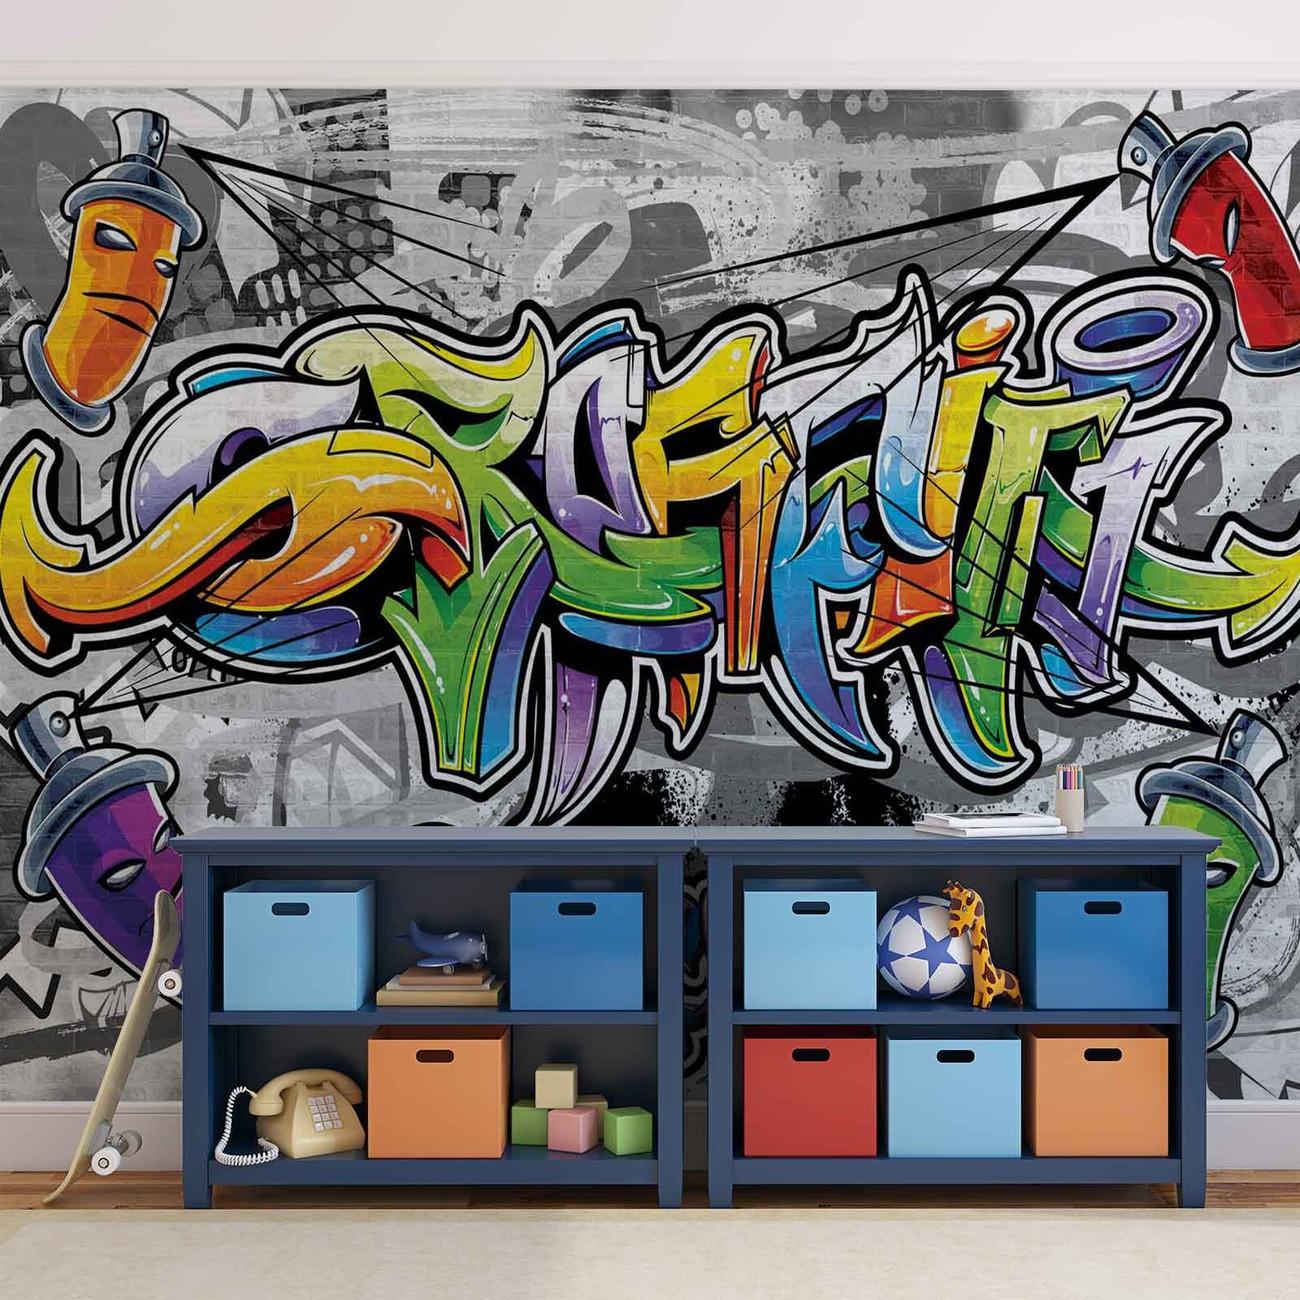 Fotomurale graffiti arte callejero papel pintado for Graffiti jugendzimmer